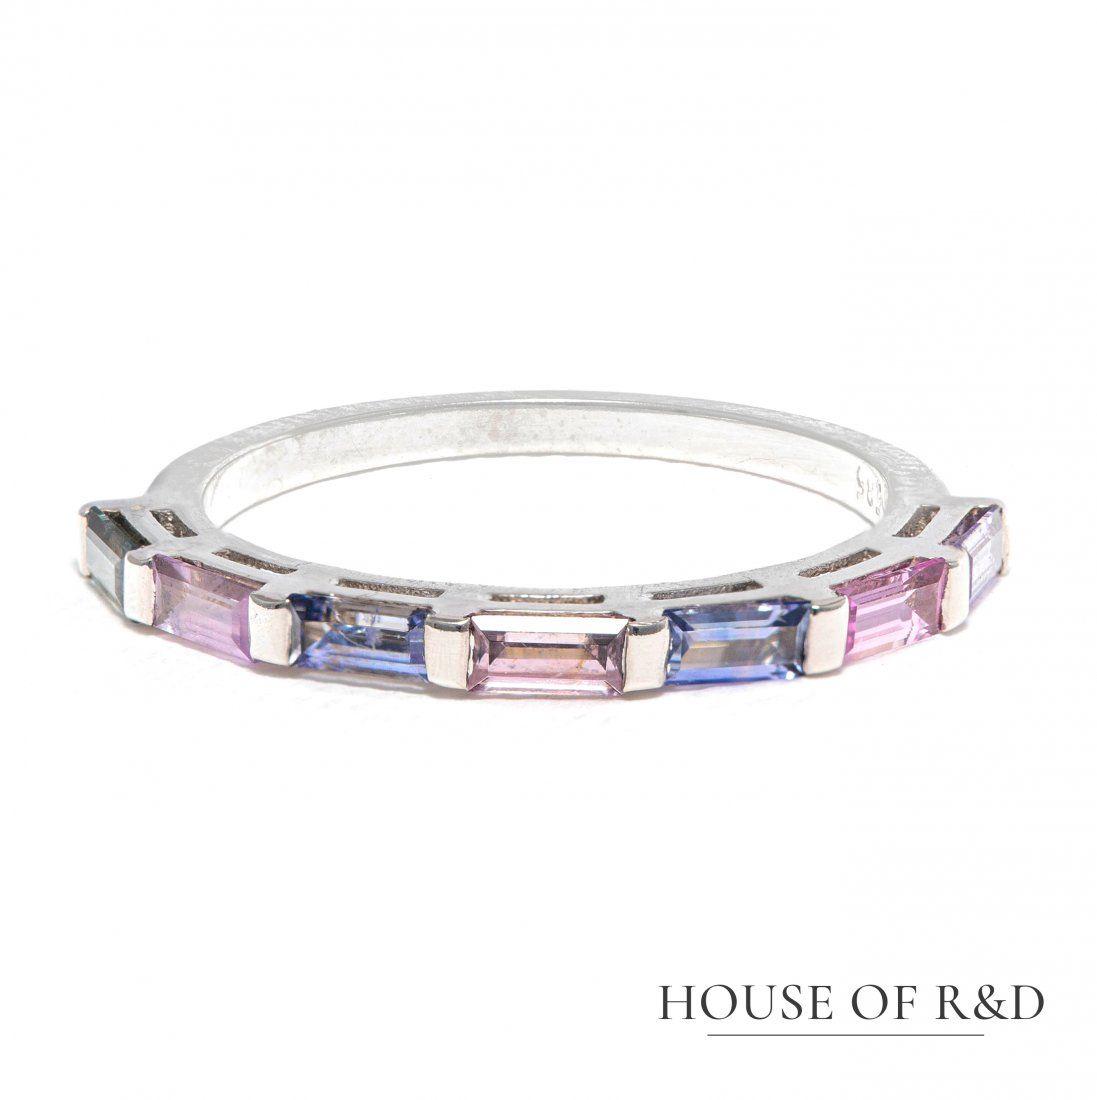 14k White Gold - 0.80tcw - Sapphire Ring